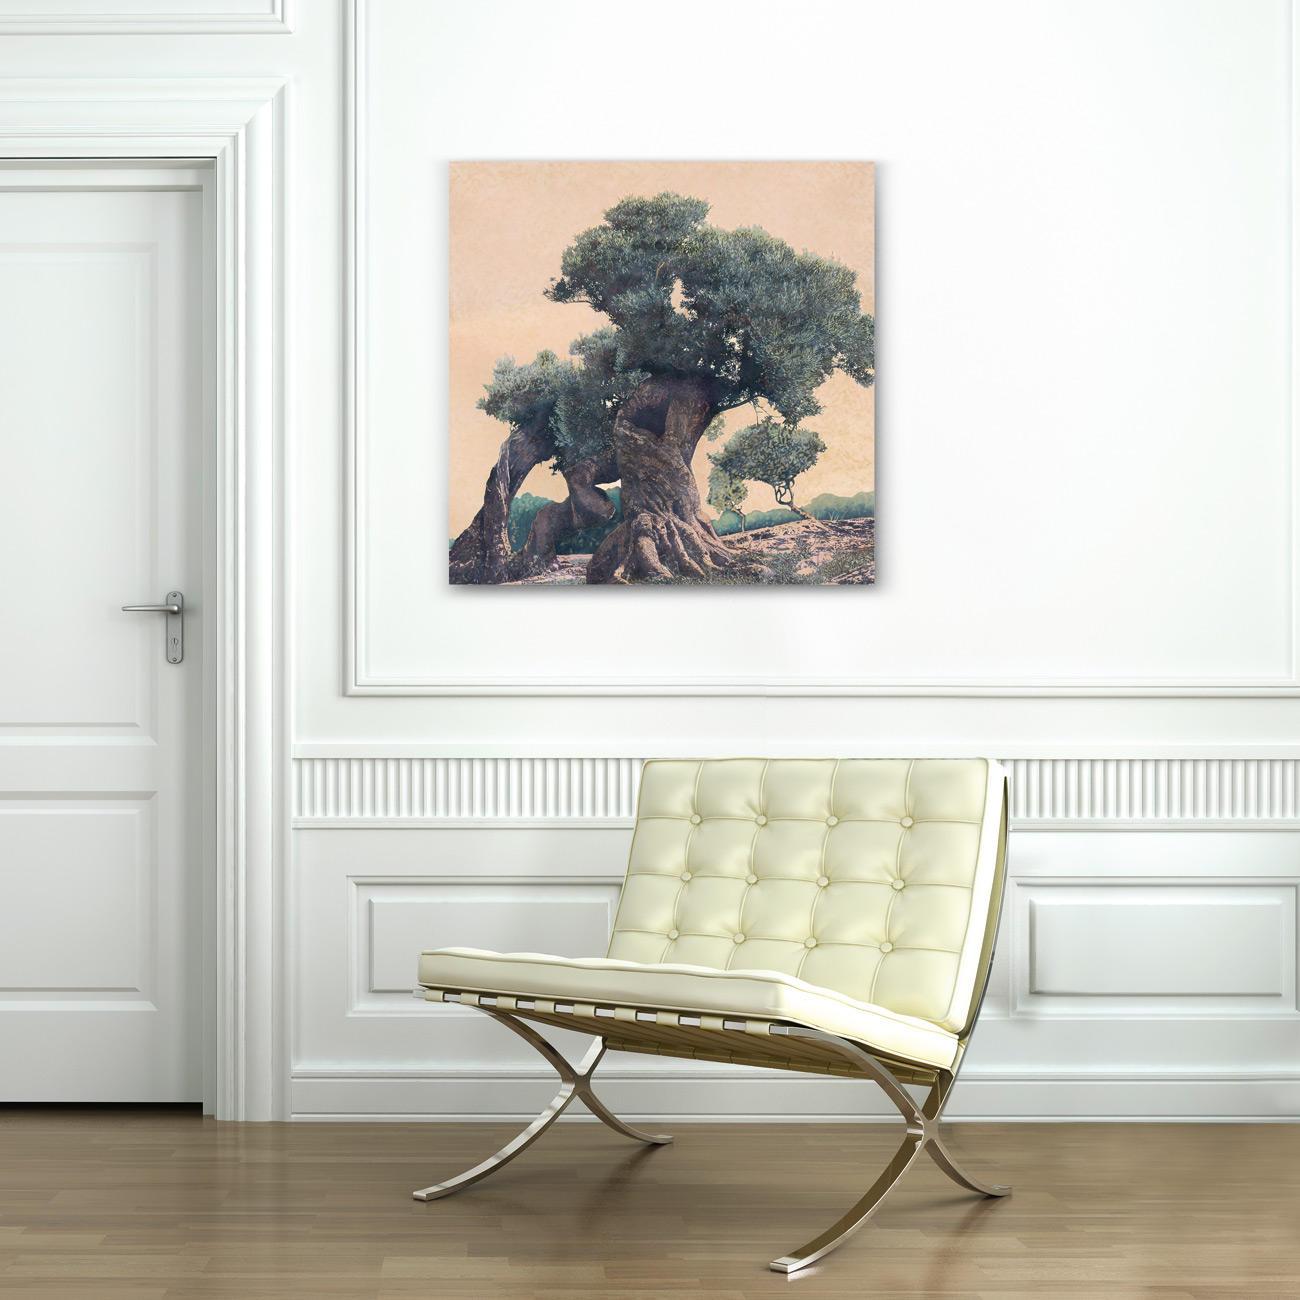 ingo wegerl olivenbaum kaufen pro idee kunstformat. Black Bedroom Furniture Sets. Home Design Ideas